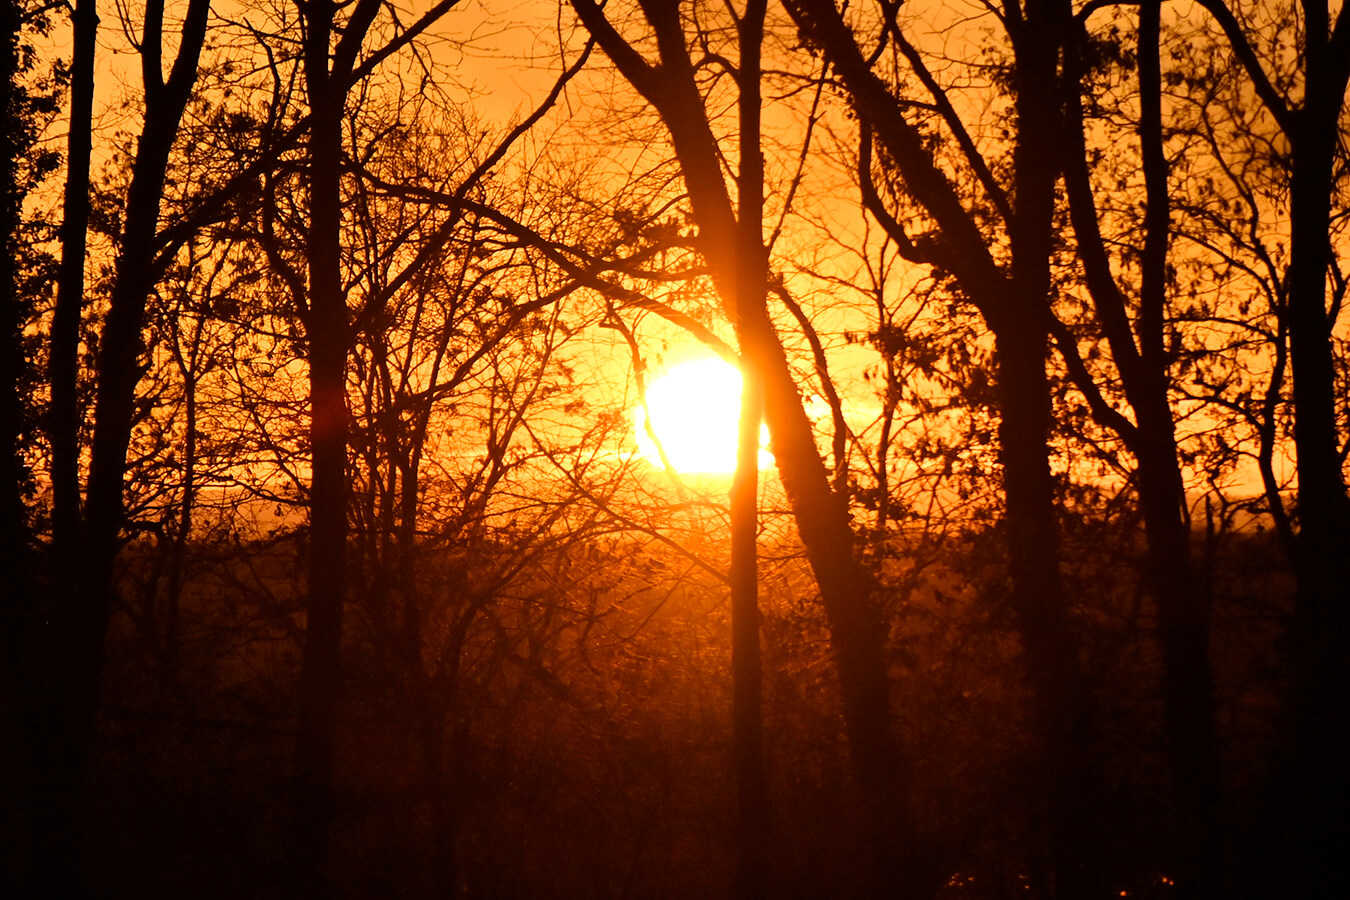 Sonnenuntergang am Sportplatz